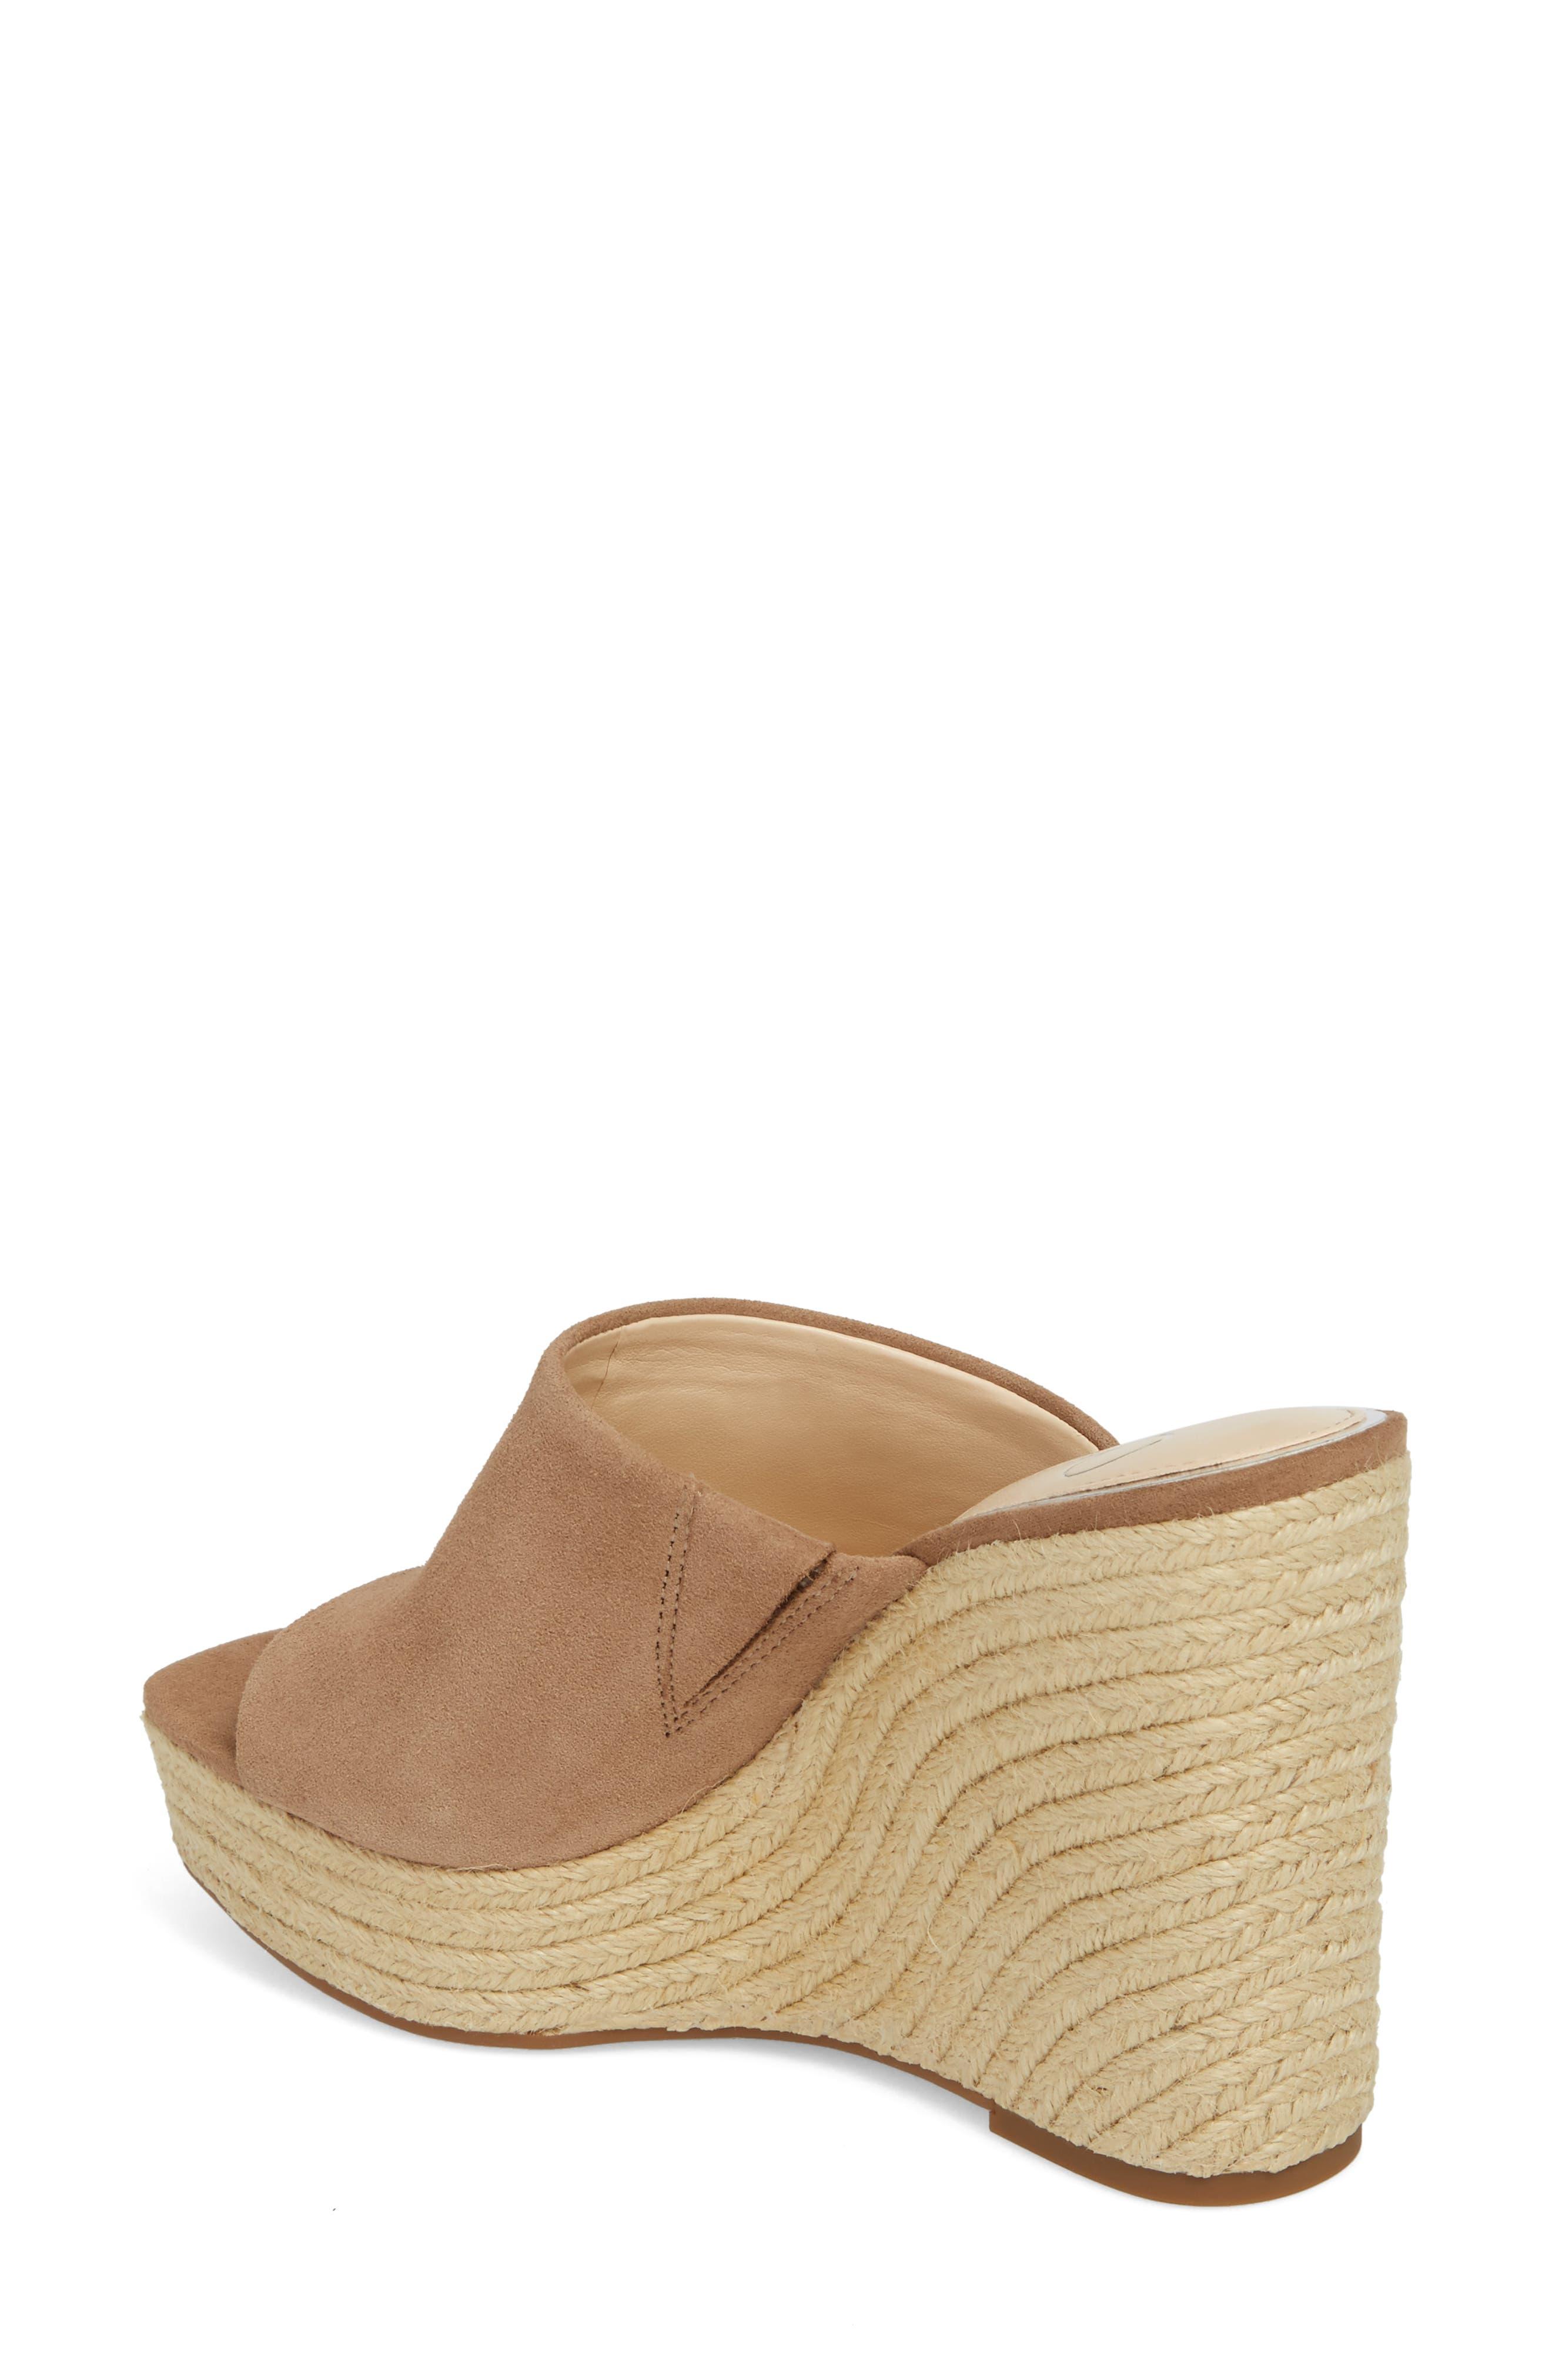 Sirella Platform Wedge Slide Sandal,                             Alternate thumbnail 5, color,